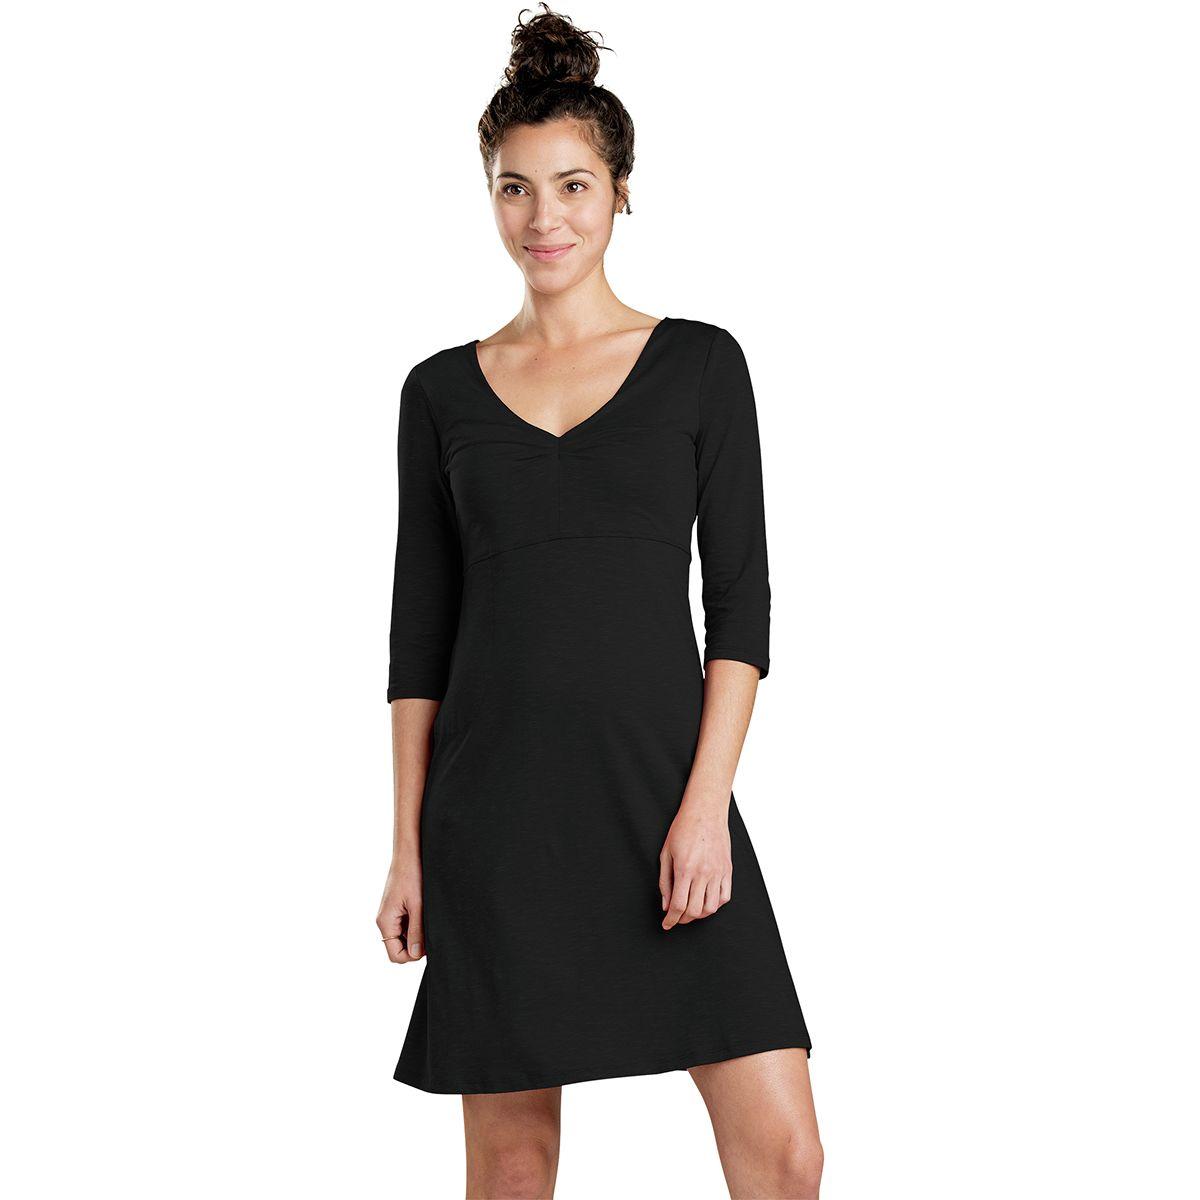 Rosalinda Dress - Women